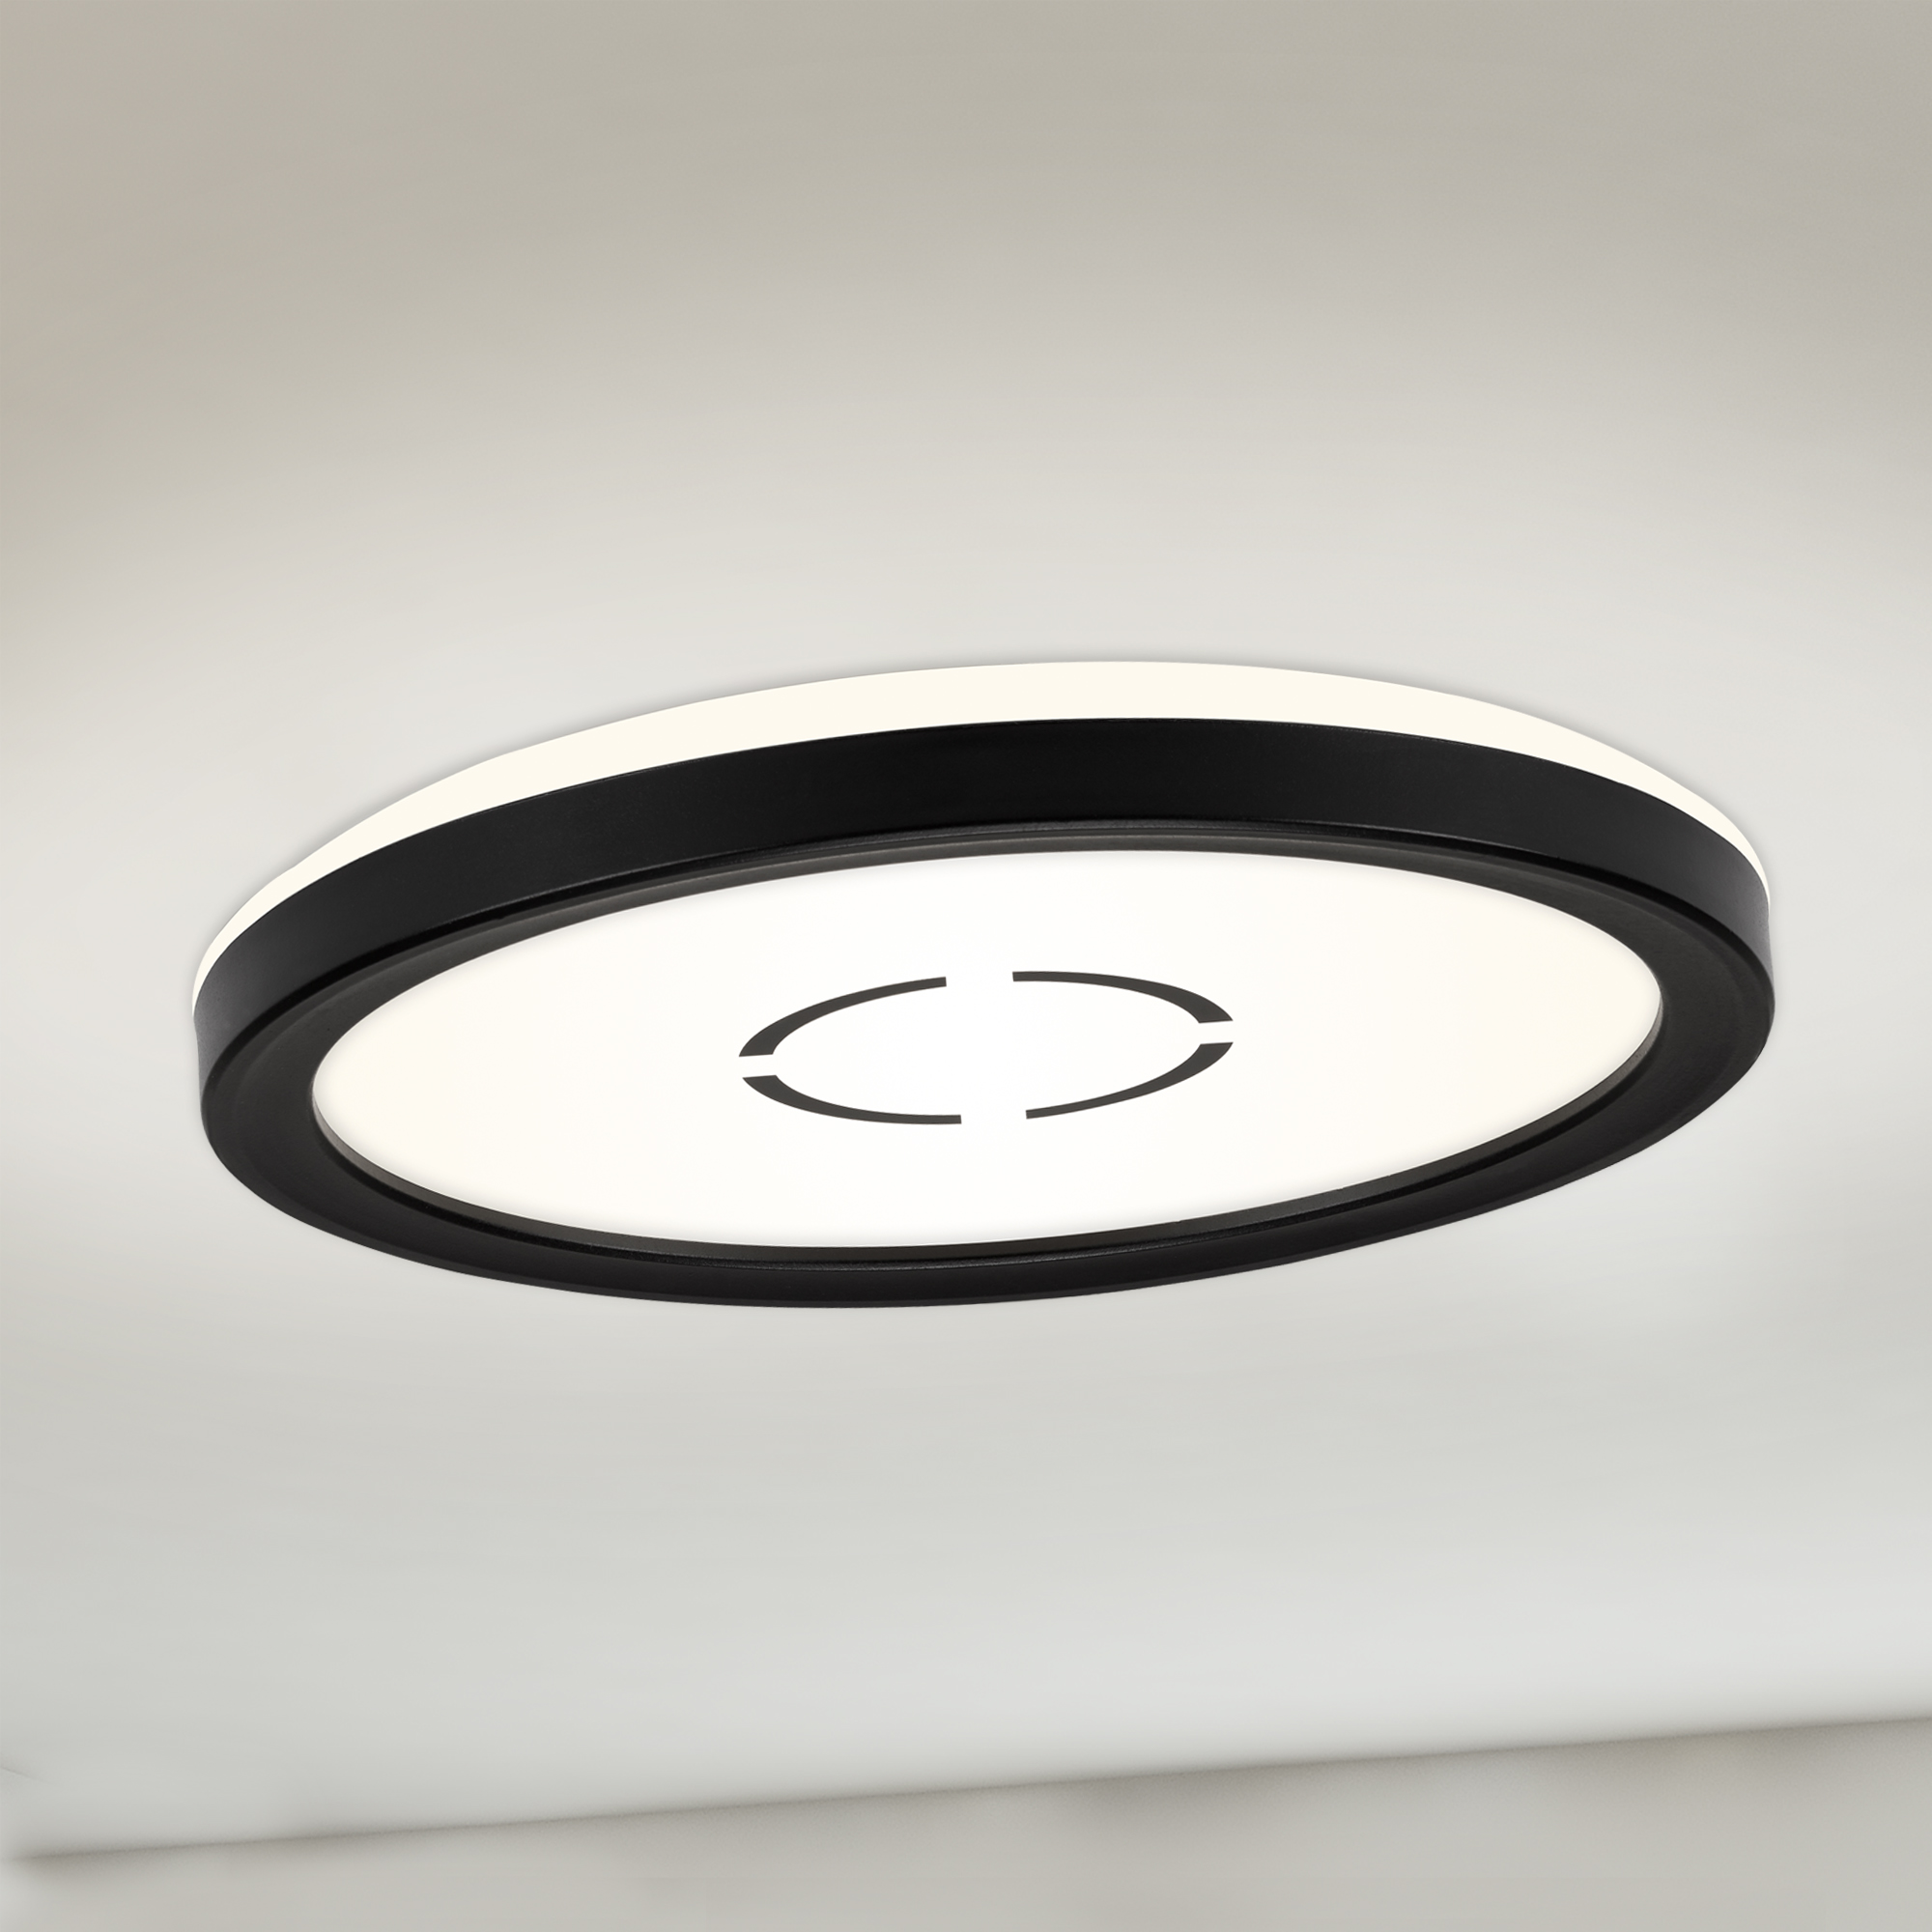 Slim LED Panel, Ø 19 cm, 1400 LUMEN, 12 WATT, Schwarz